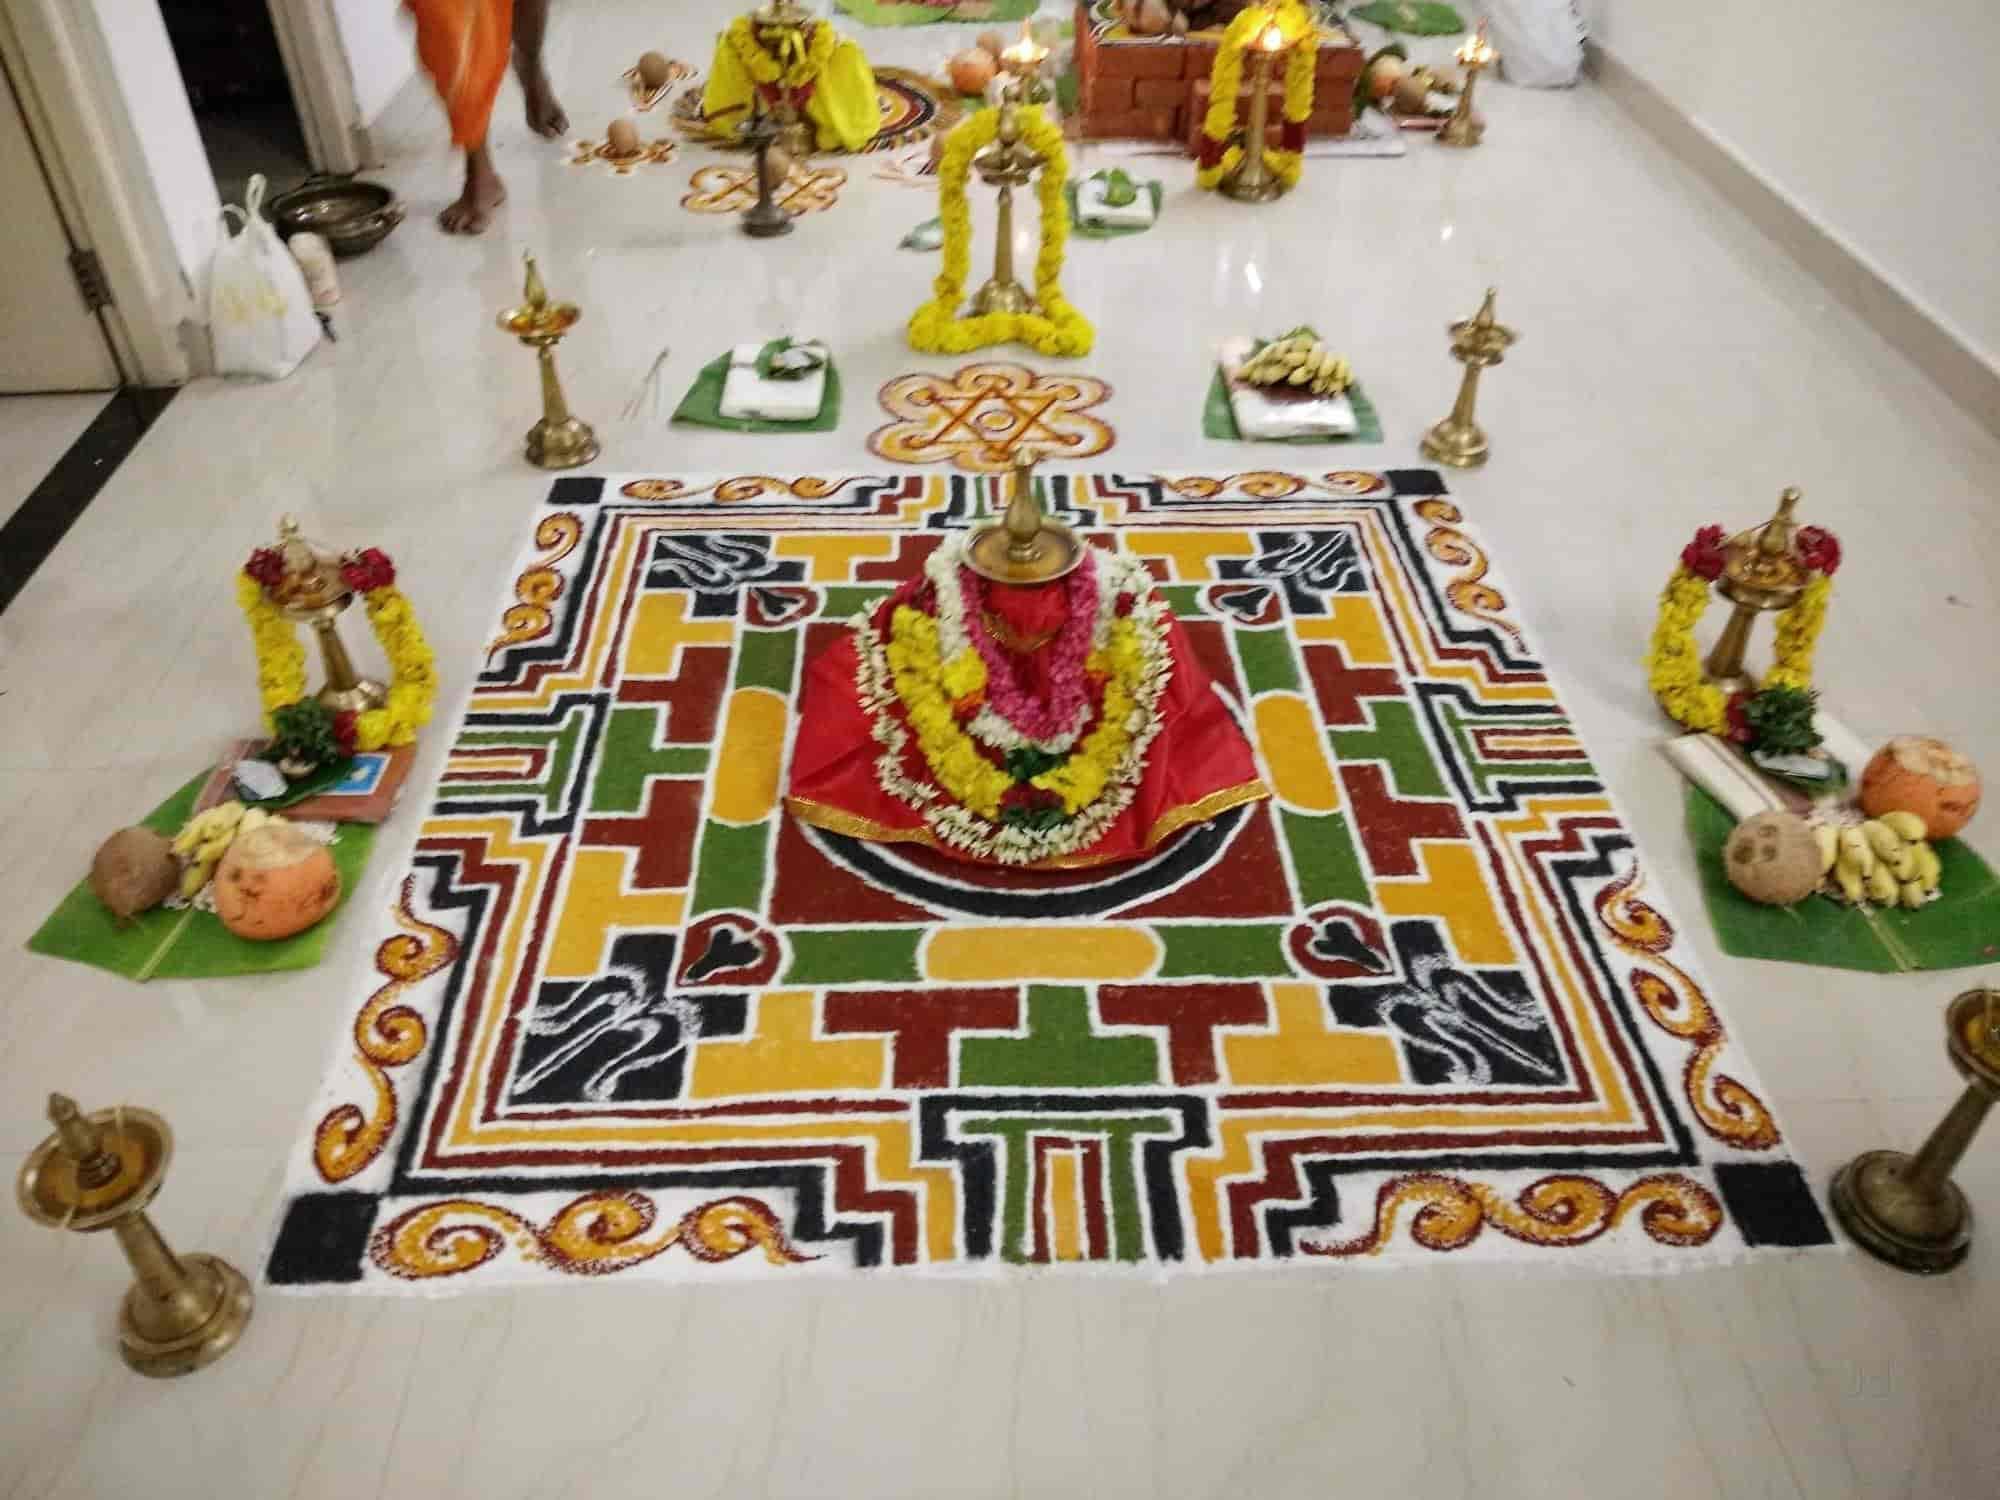 Top 100 Astrologers in Vembayam - Famous Astrologers